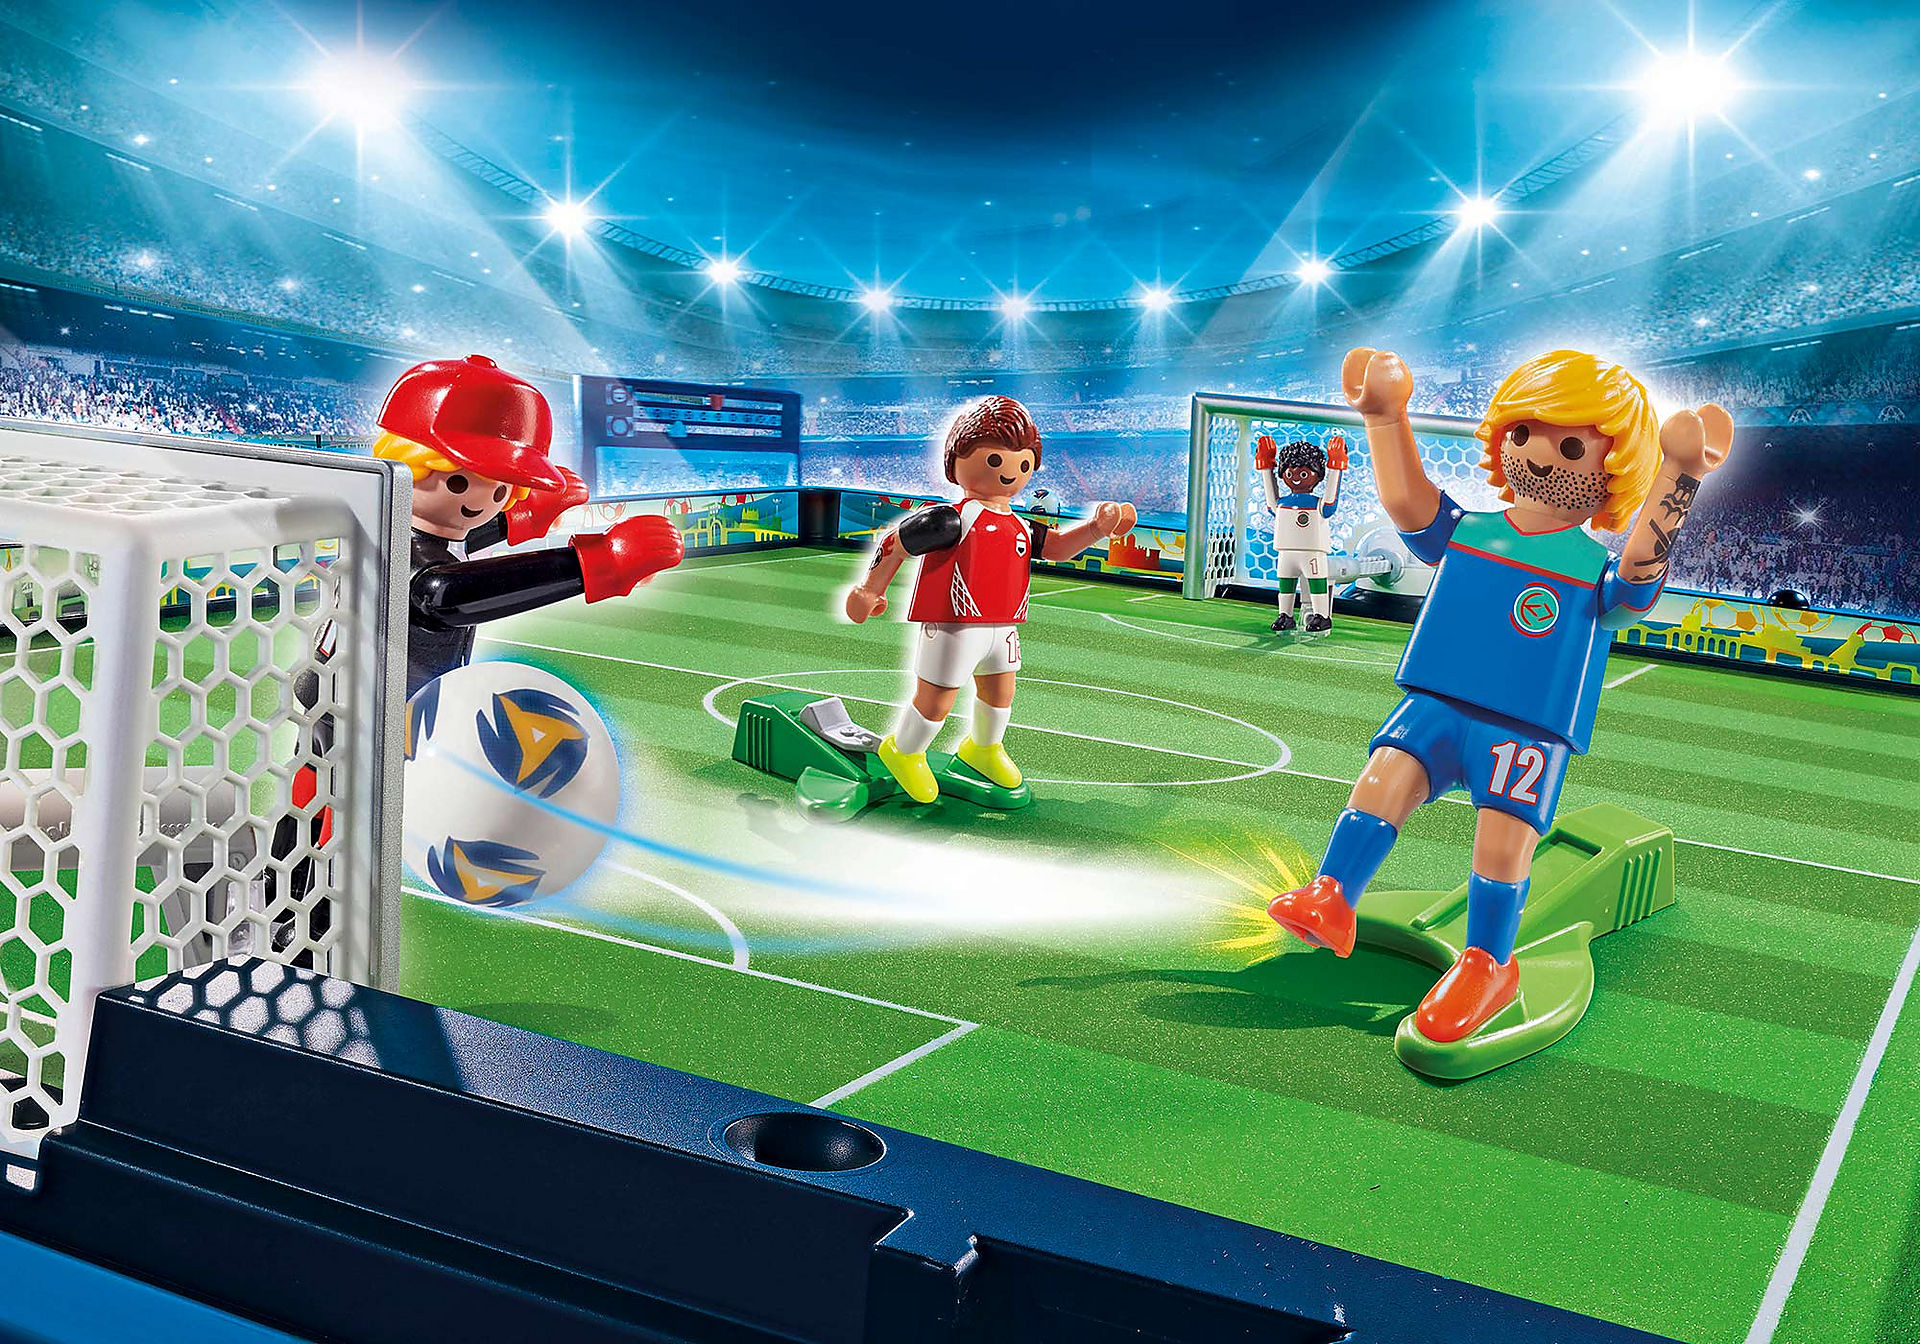 70244 Soccer Field zoom image1